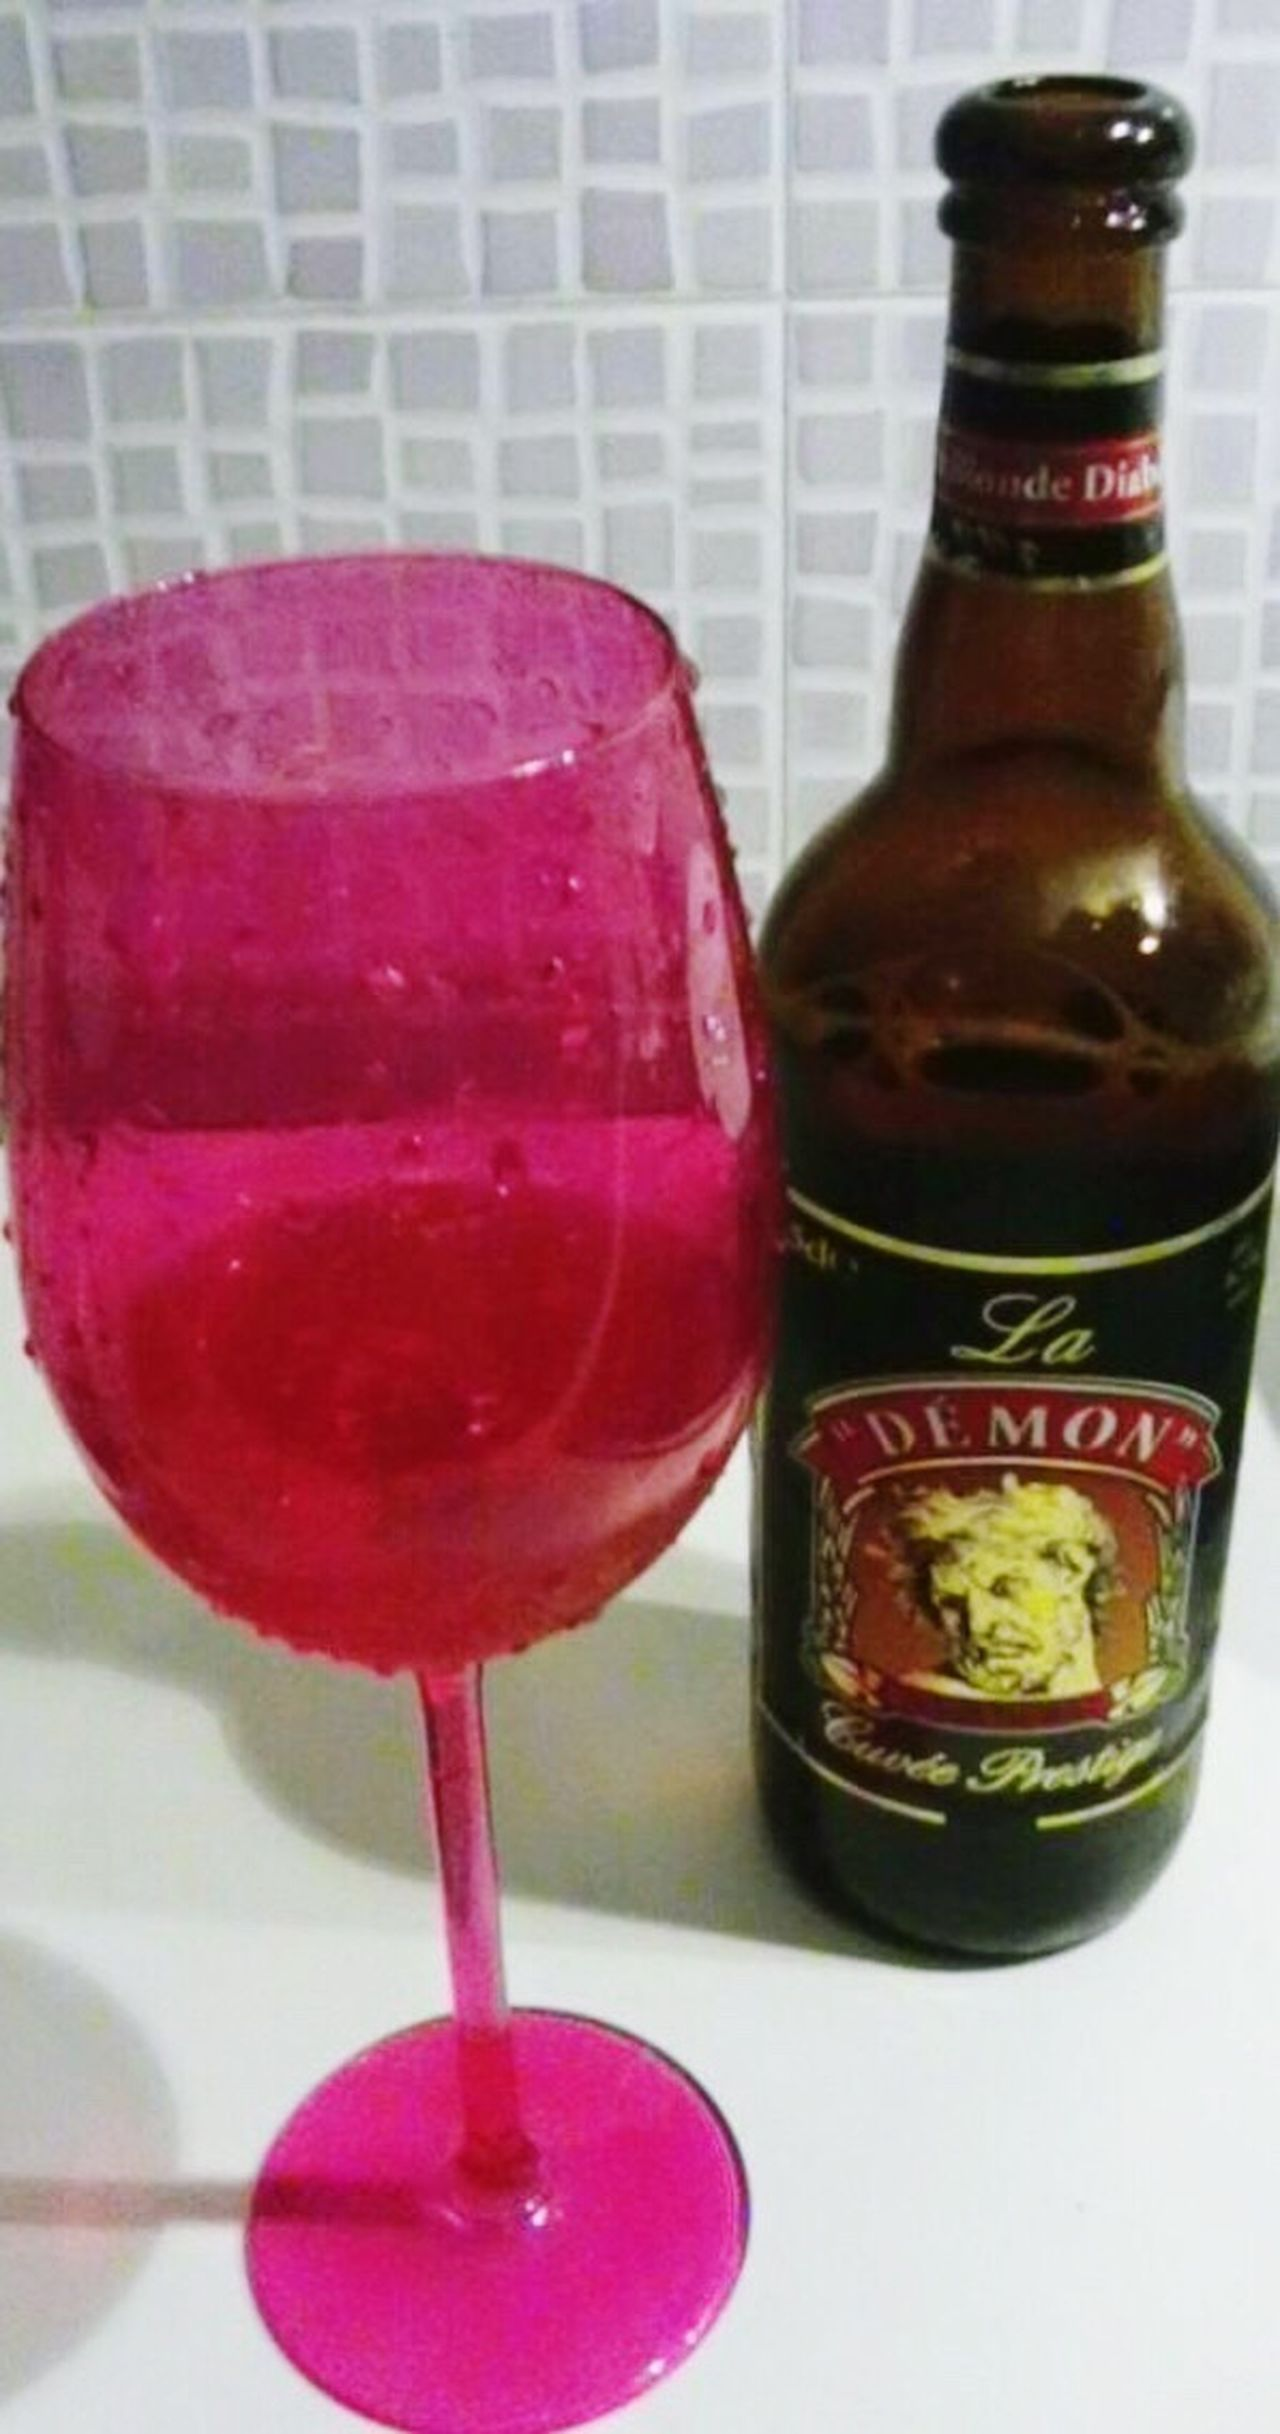 Wine Moments